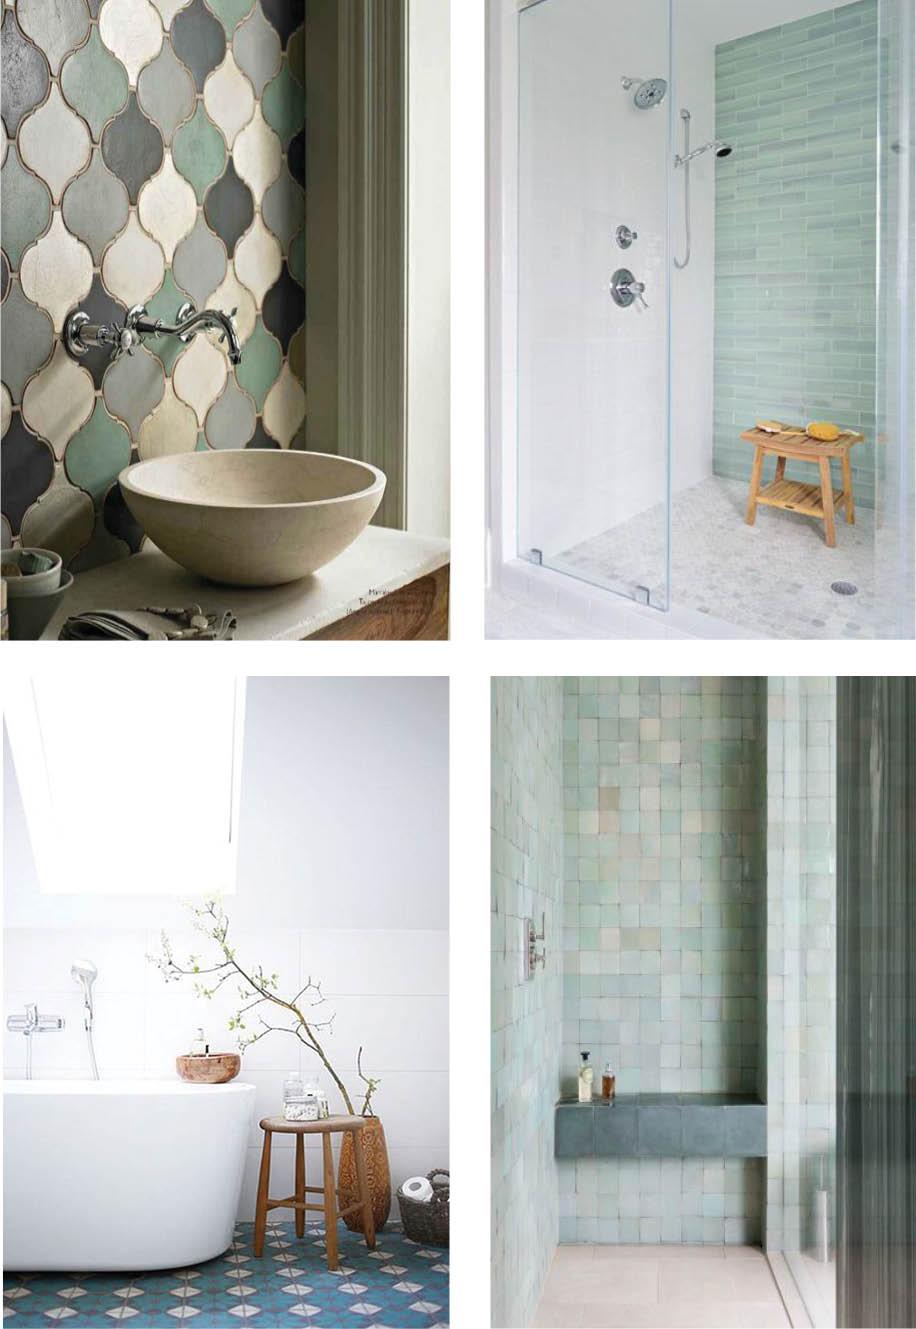 Home depot ceramic tiles bathroom